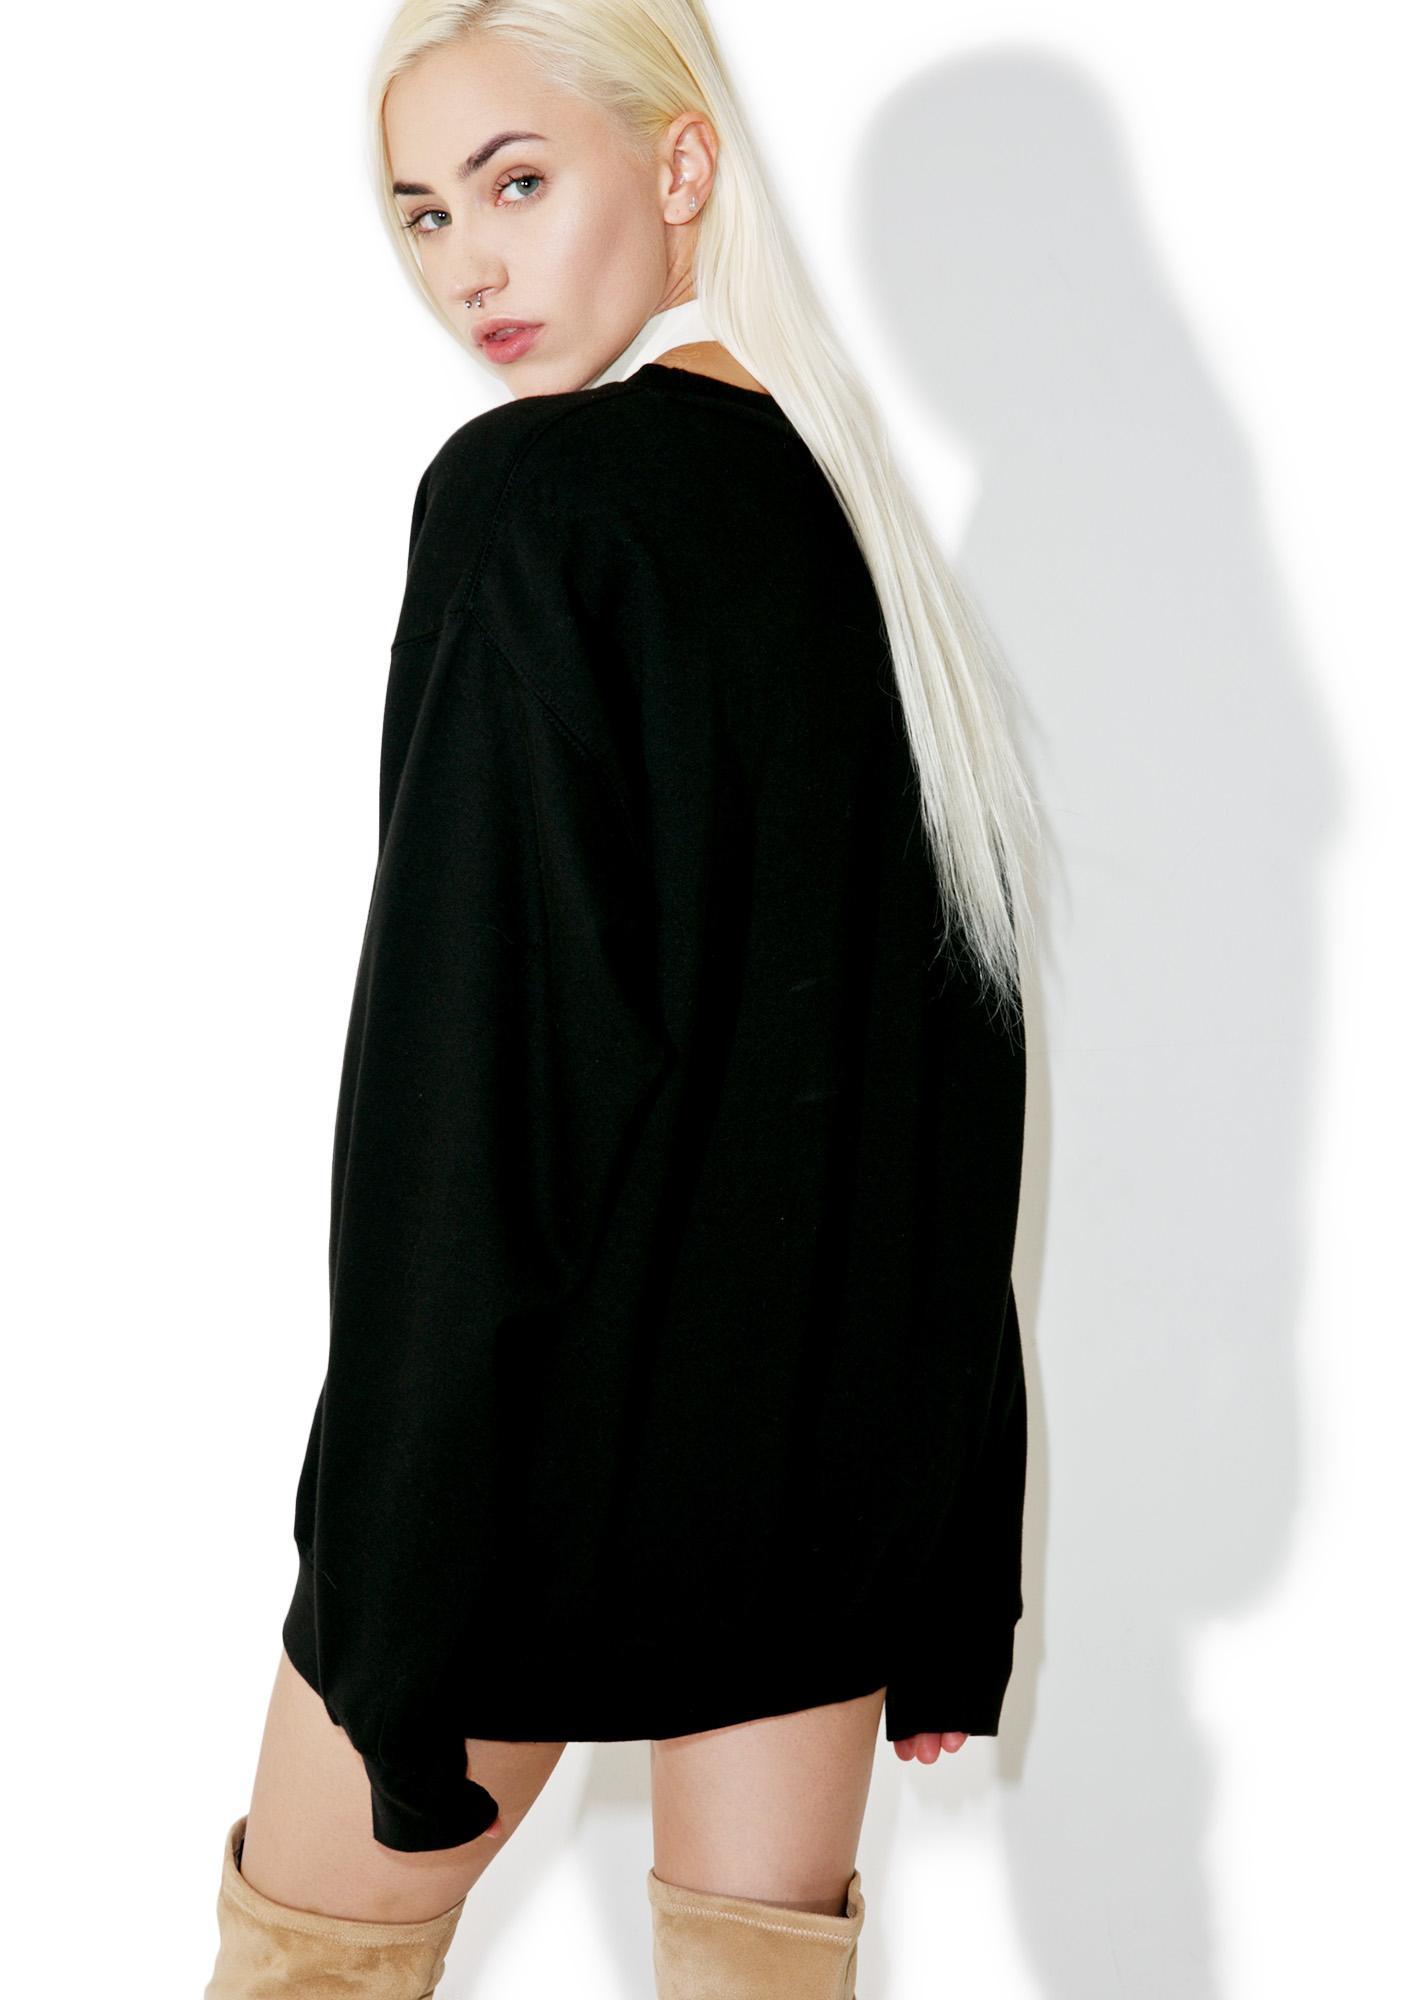 HLZBLZ The Night Sweatshirt